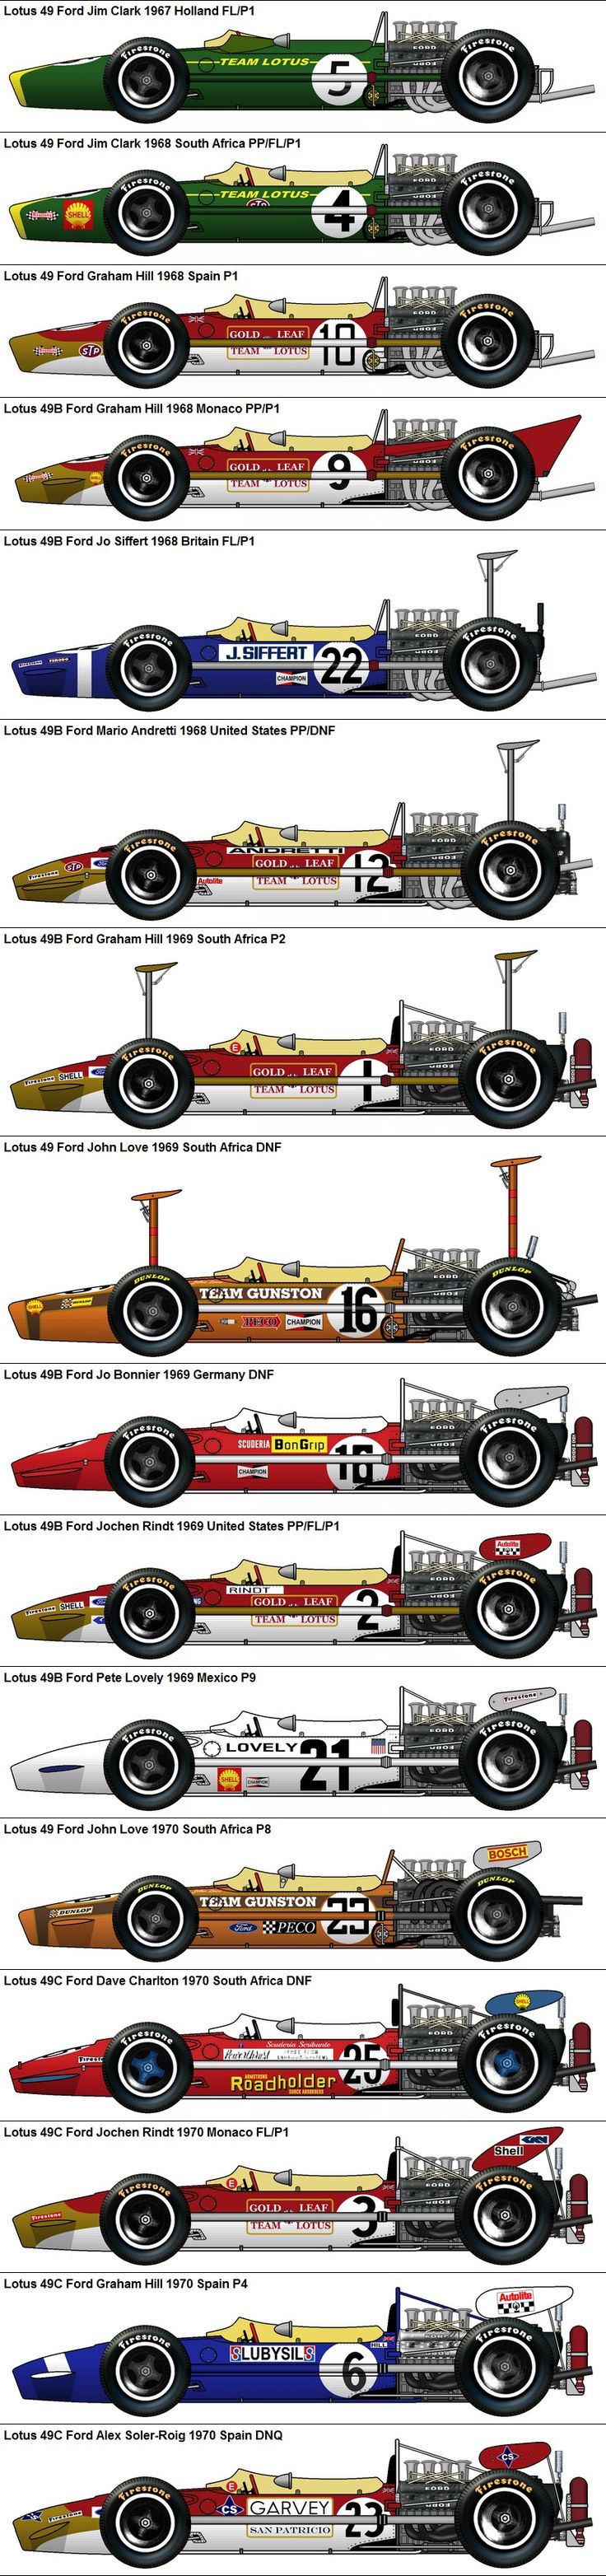 Formula One Grand Prix Lotus 49 Fords 1967-1970